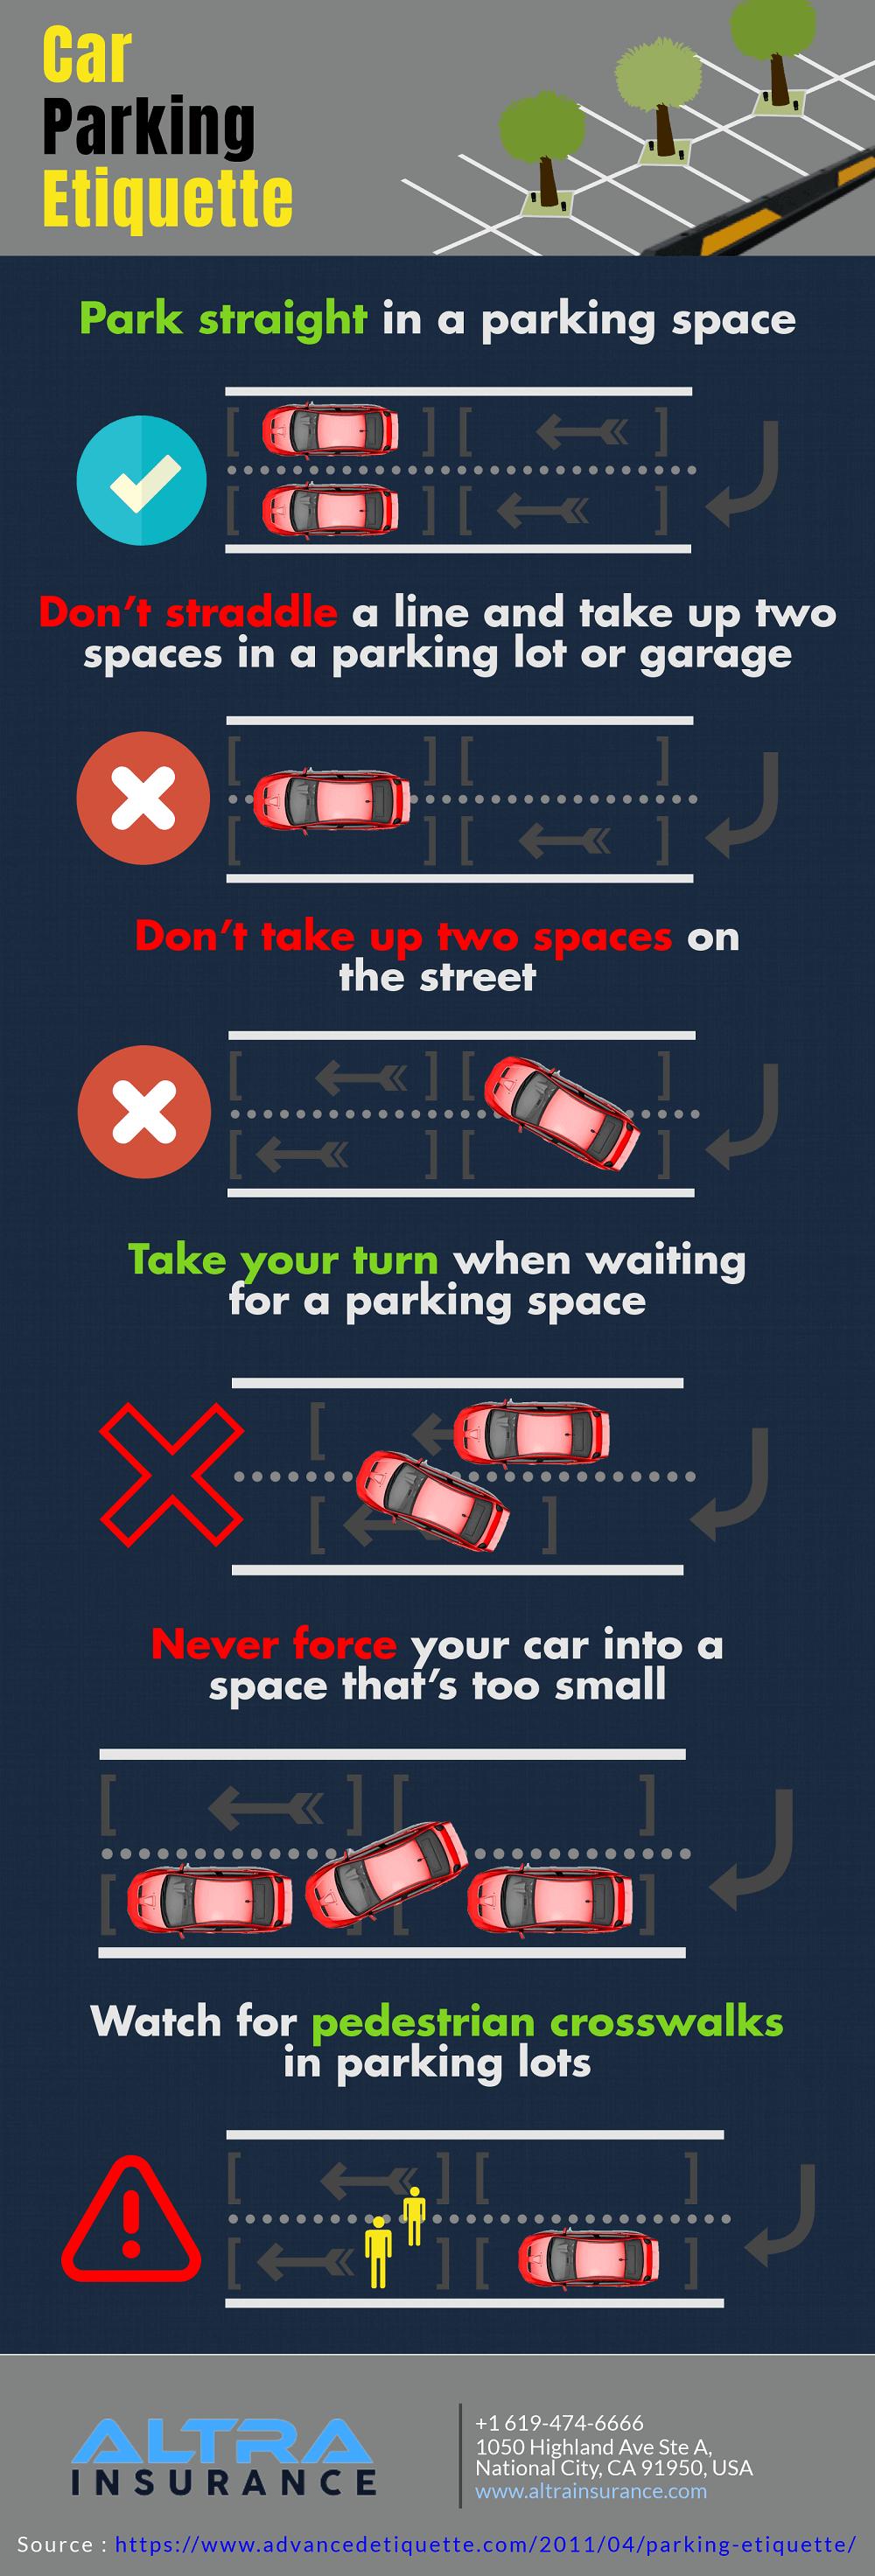 Etiquette for Parking Your Automobile [Infographic]